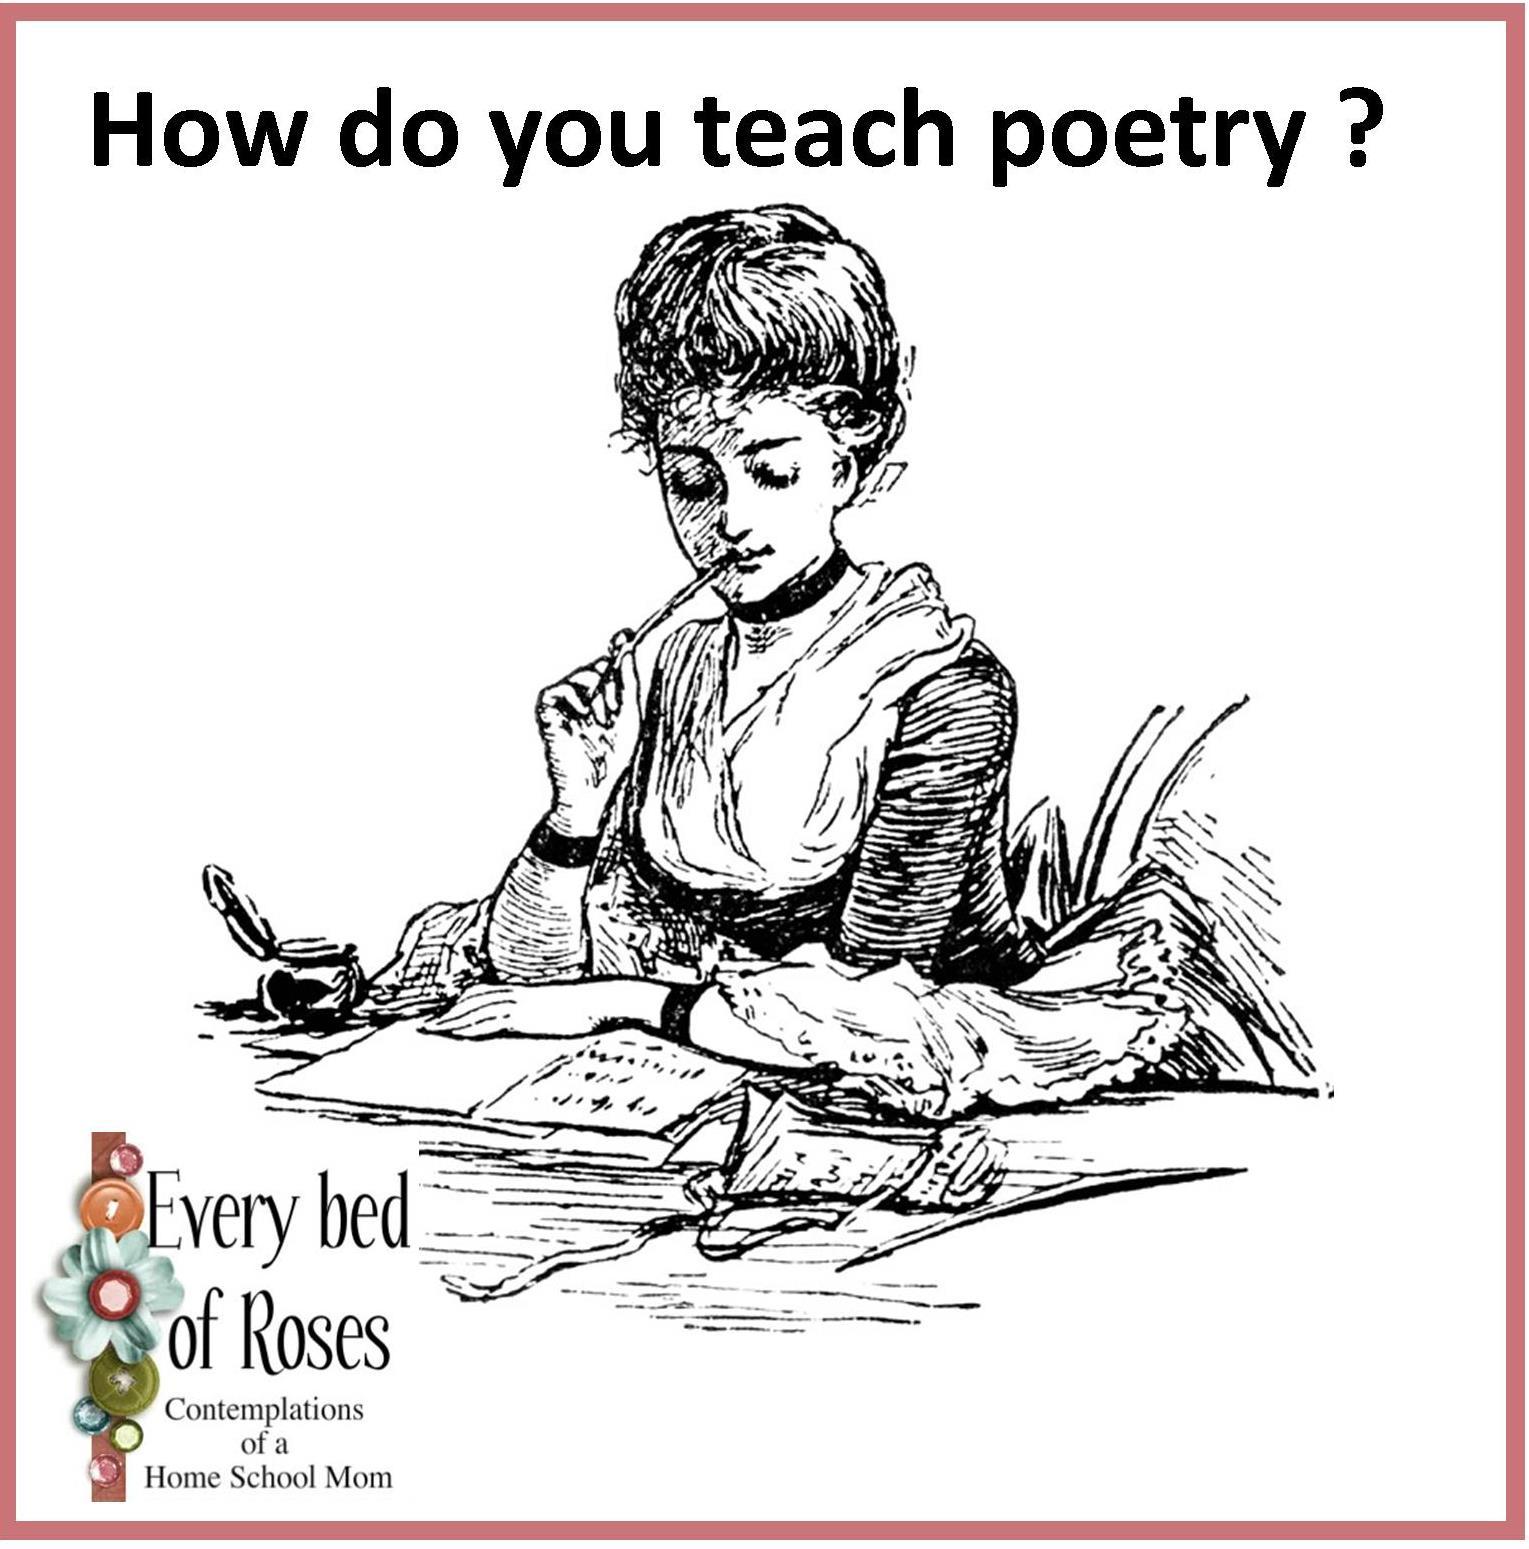 Cope poetry is for pleasure